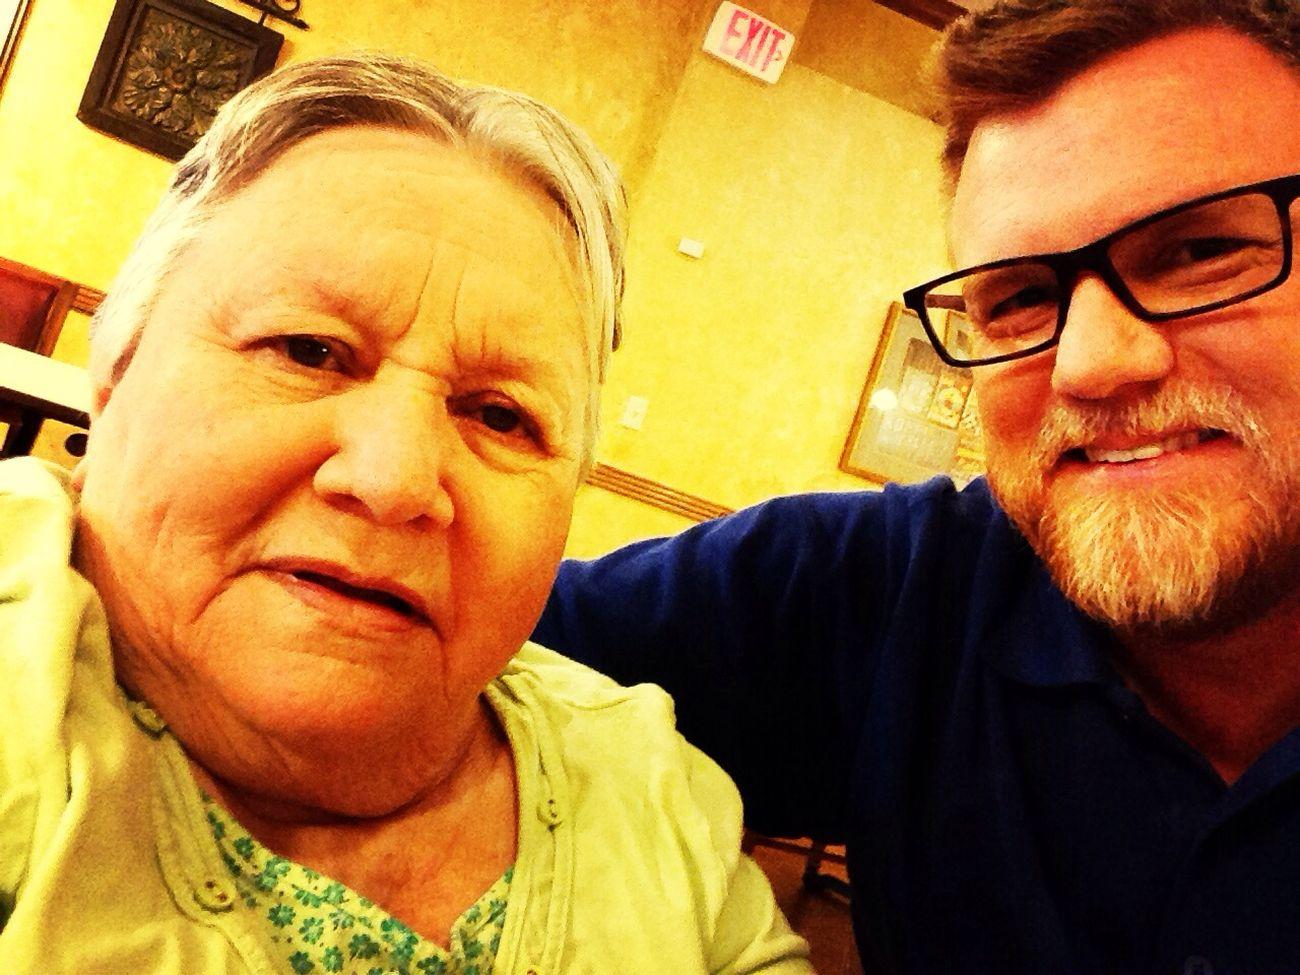 Mom AlzheimersAwareness EyeEm Best Shots - People + Portrait That's Me